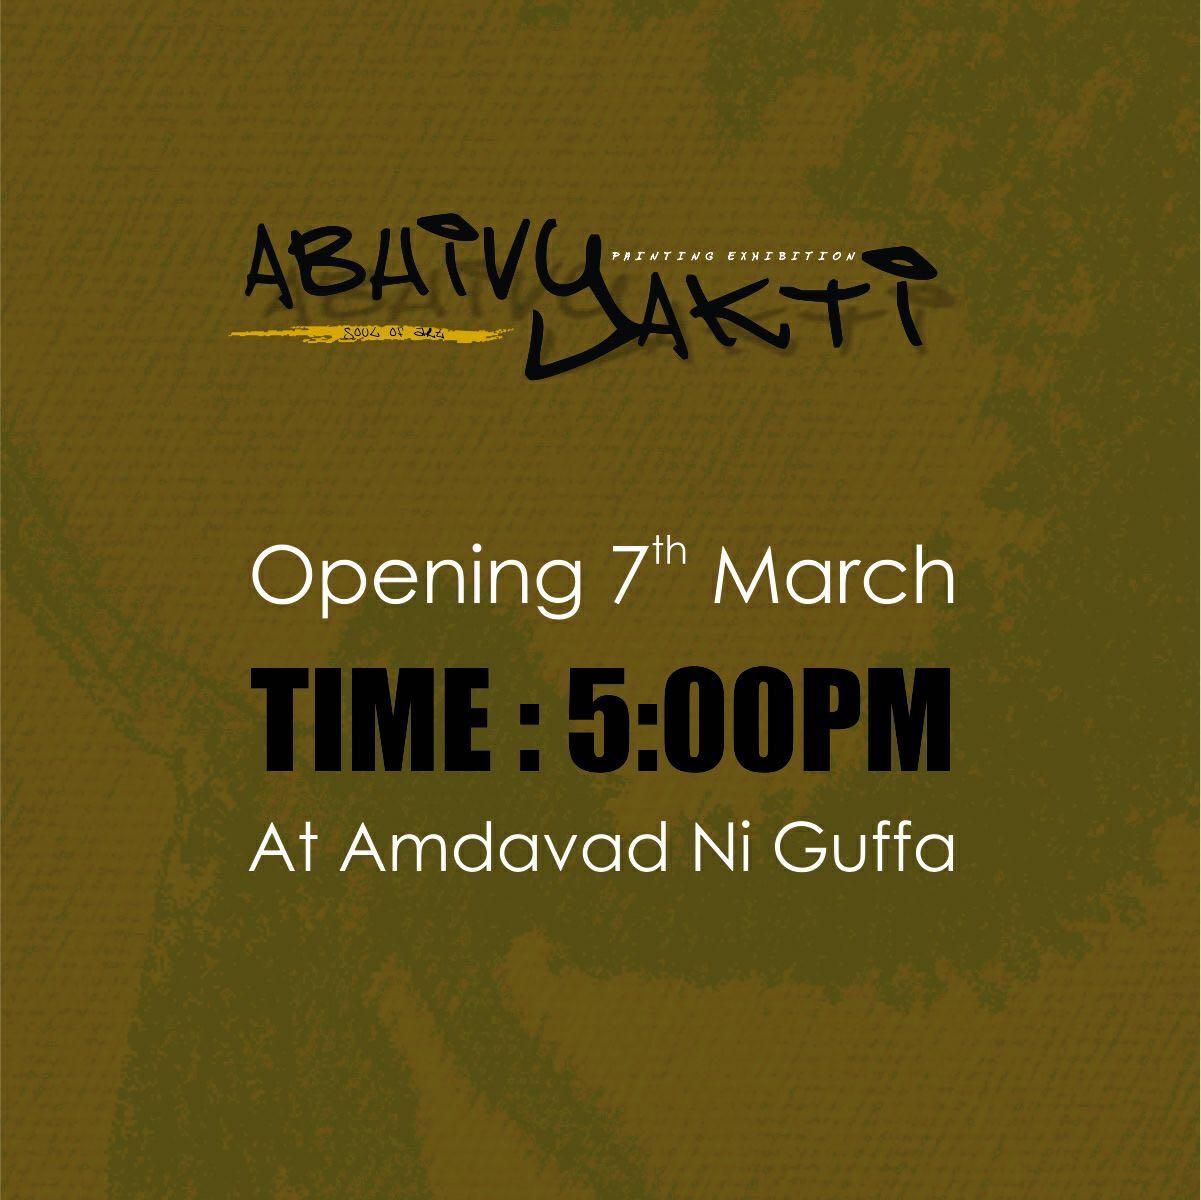 https://creativeyatra.com/wp-content/uploads/2017/03/Abhivyakti-Amdavad-ni-Gufa-Ahmedabad-1.jpeg